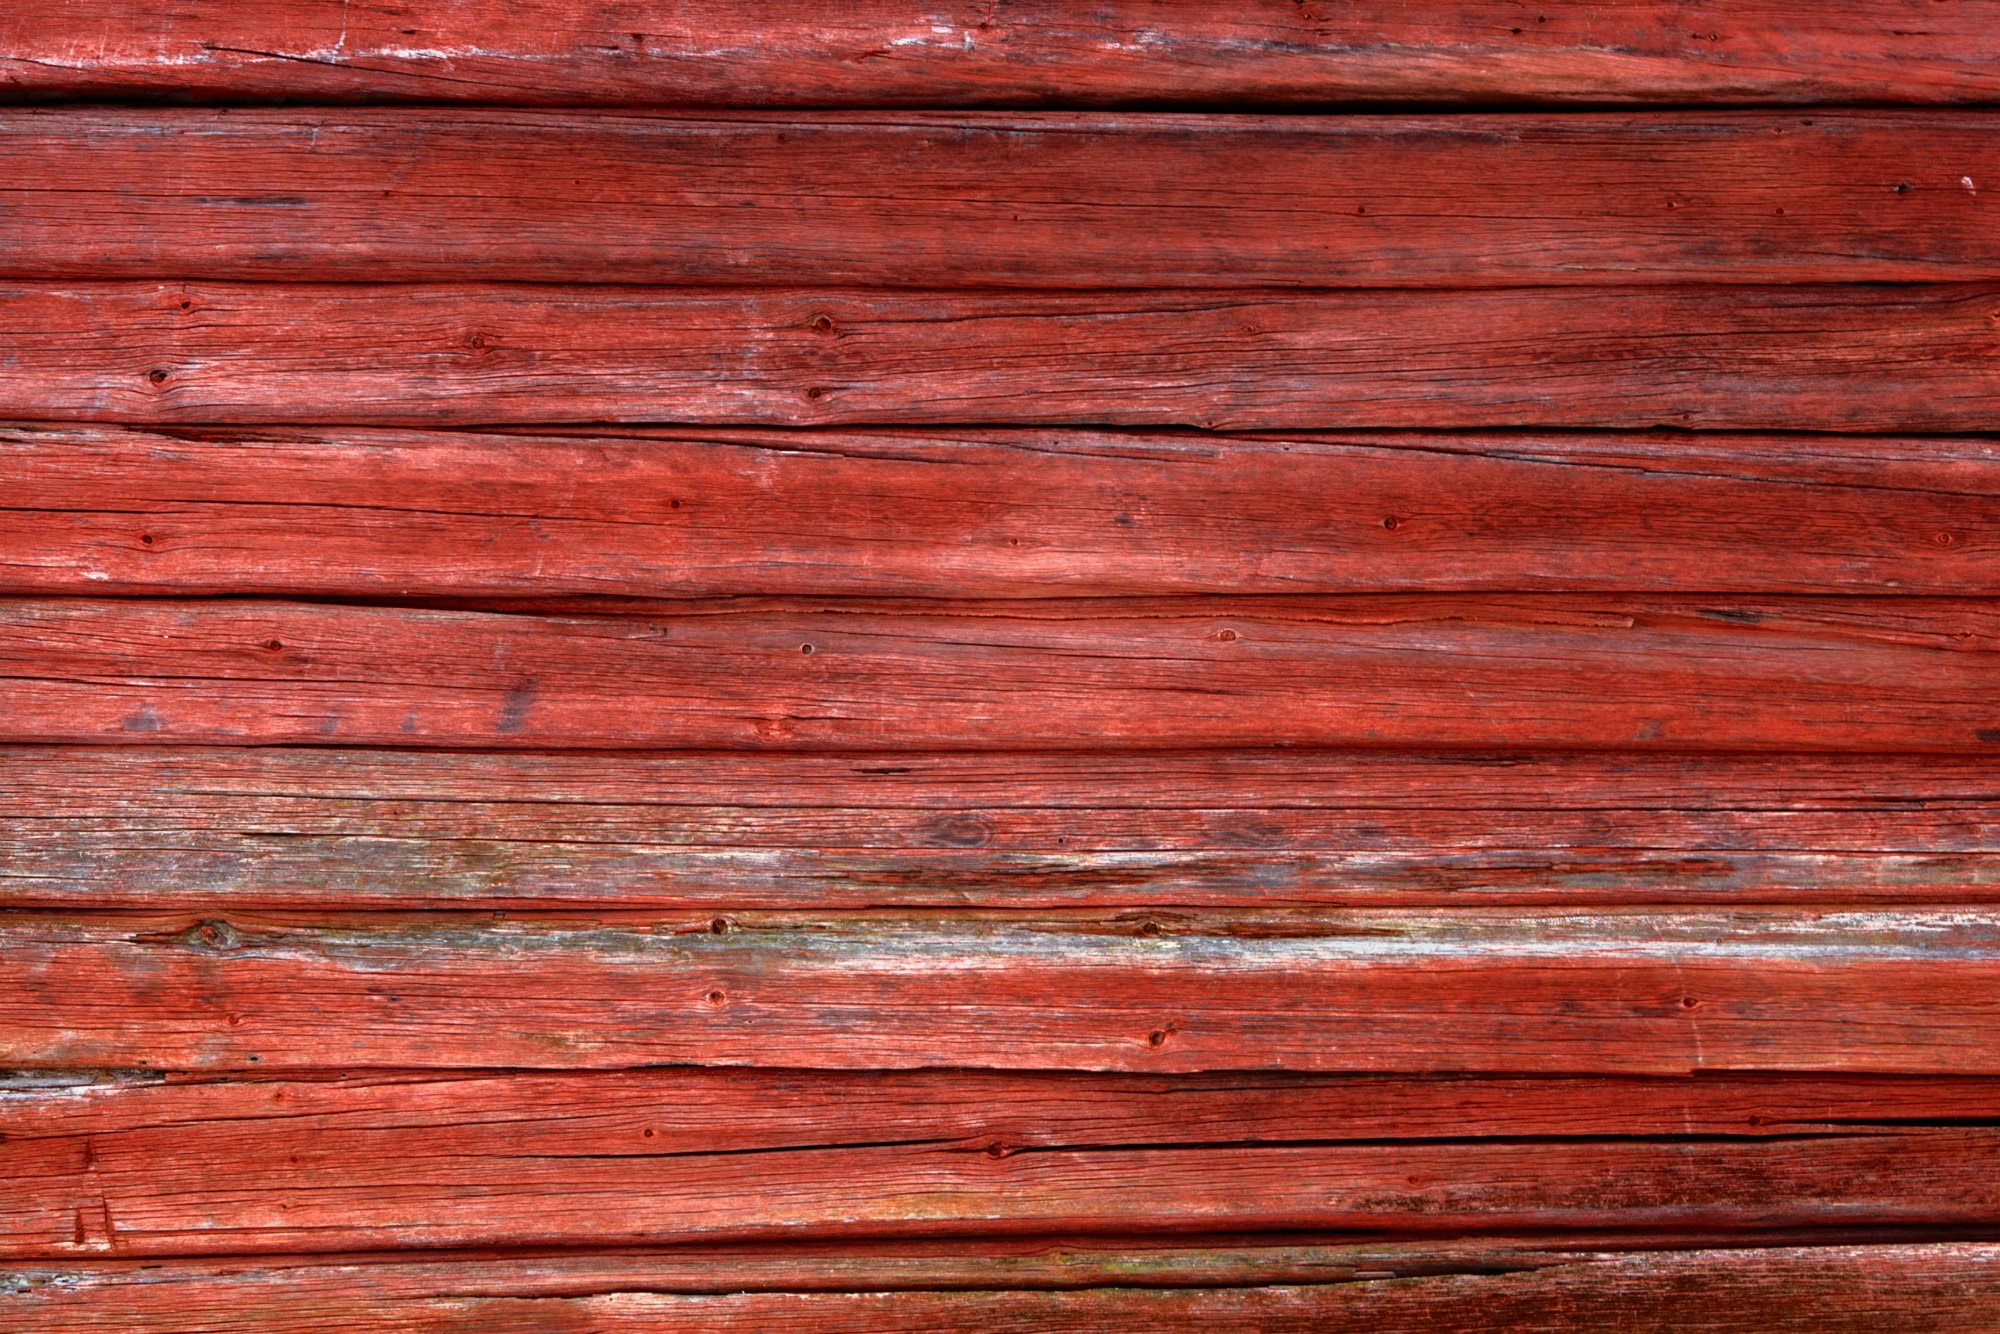 Background Dark Rustic Wood Red Barn 2000x1334